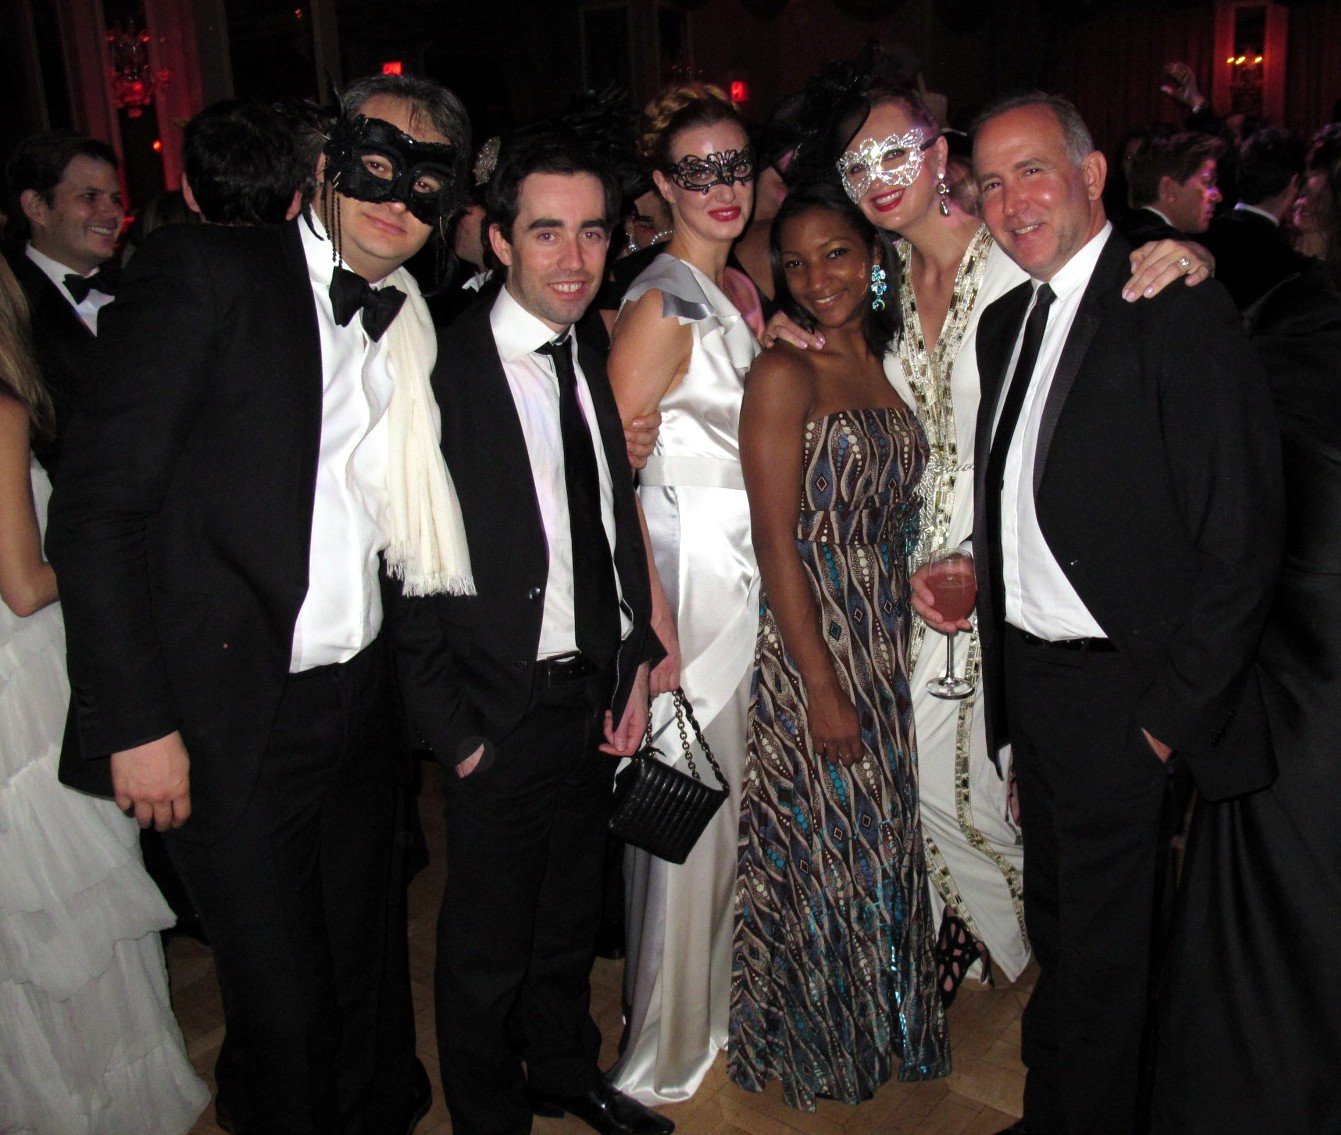 Yan Assoun+Olivier Blaise+Polina Proshkina+Lana Smith+Dionisio Fontana Save Venice Masquerade Ball Un Ballo in Maschera